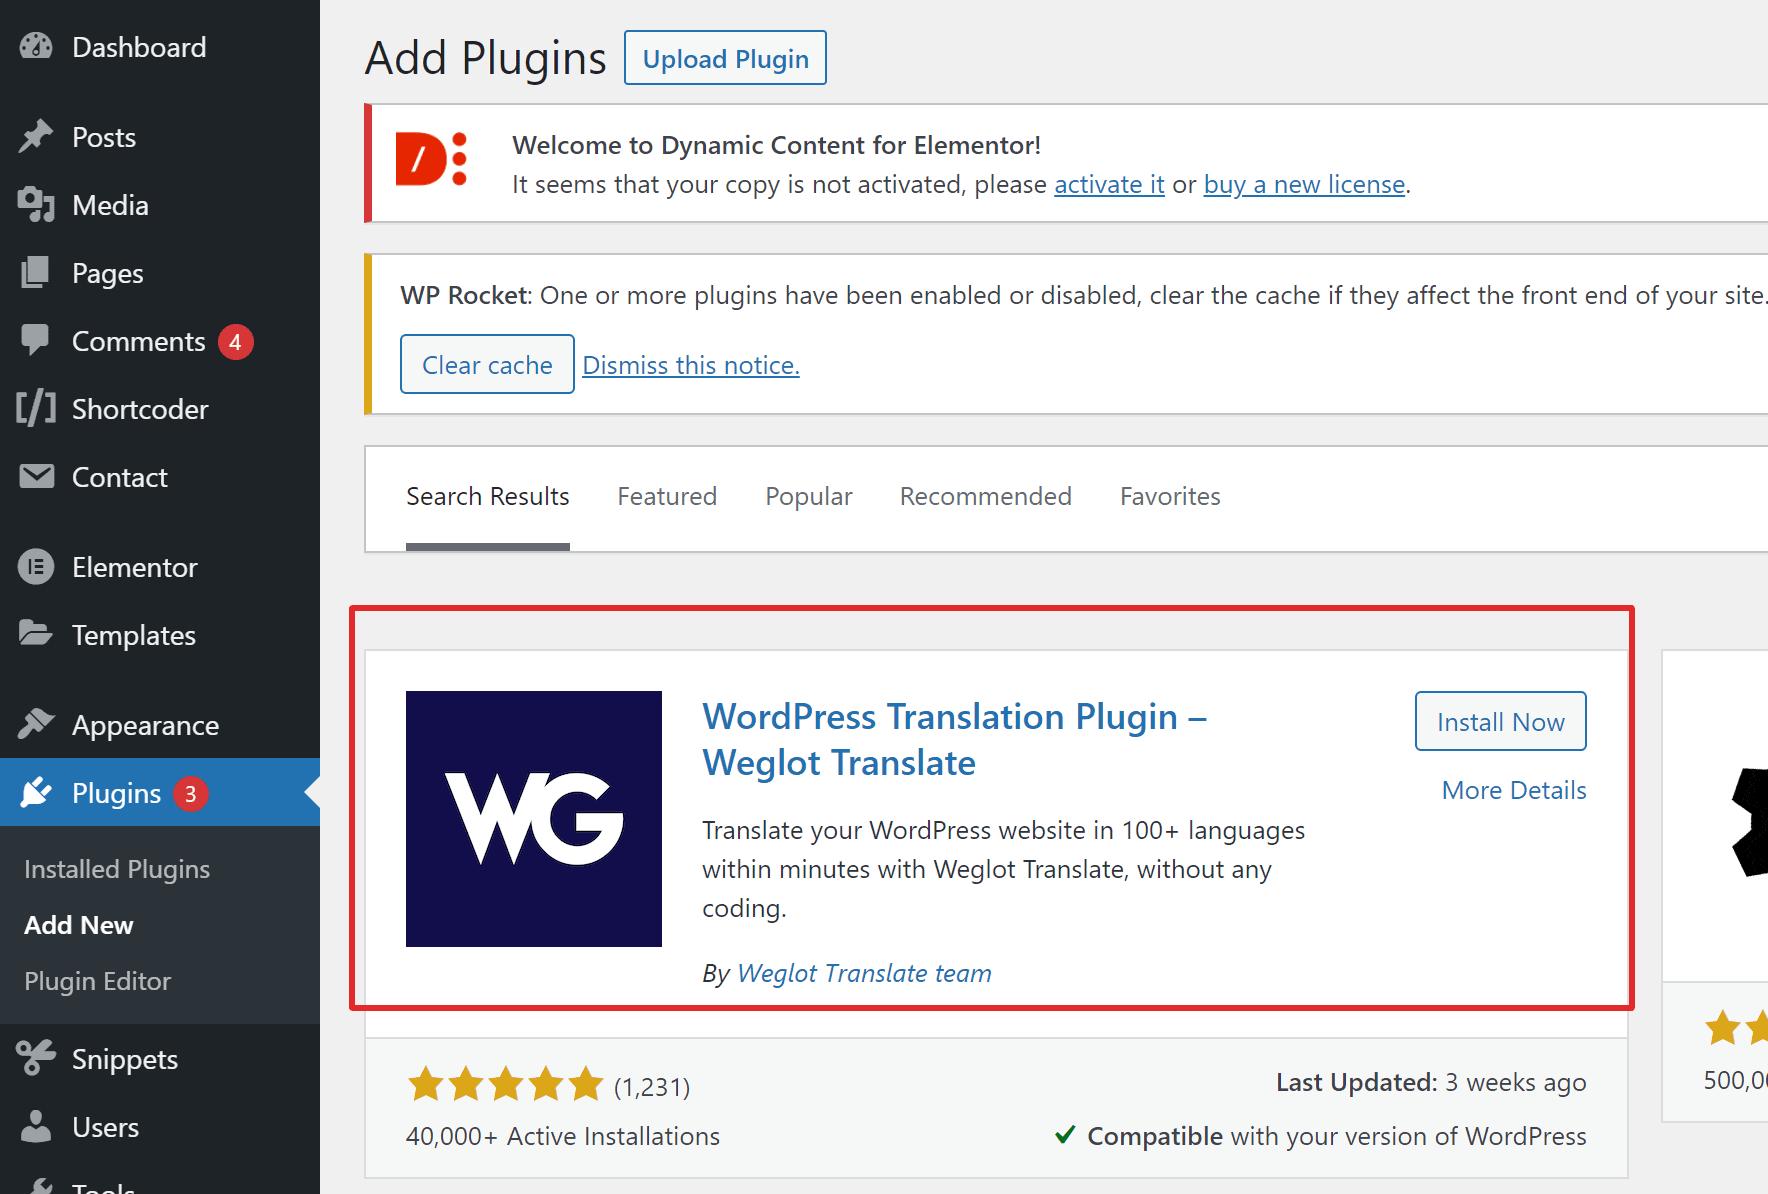 Weglot plugin download